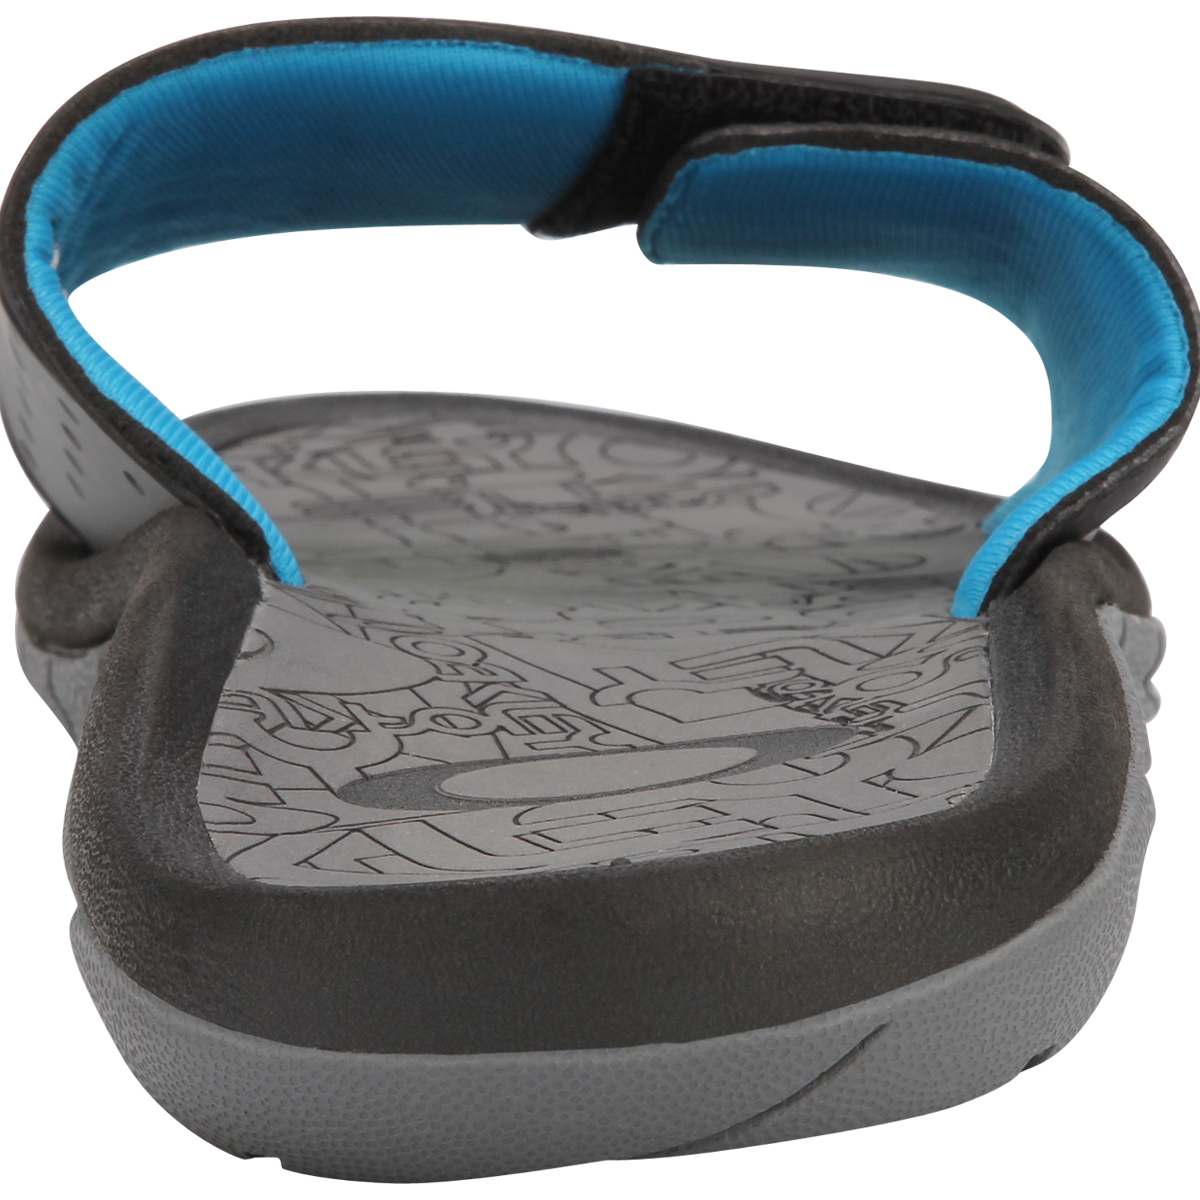 c98e6b6e5ba Chinelo Oakley Super Coil Slide Preto Com Azul ref 10132-012